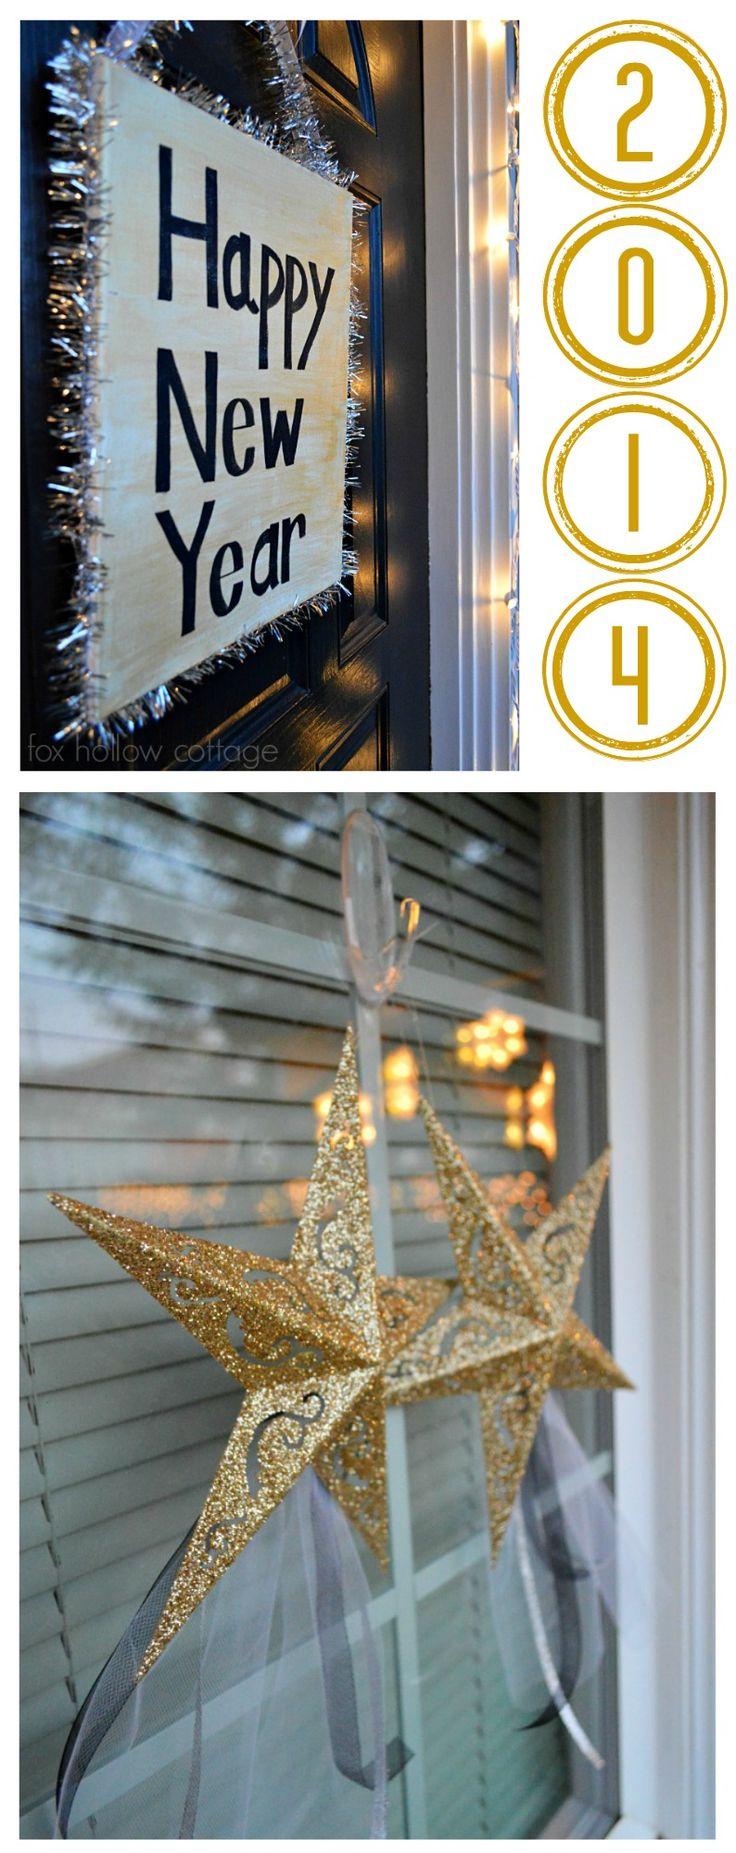 New Years Eve 2012 #decoratingideas #diy #crafts